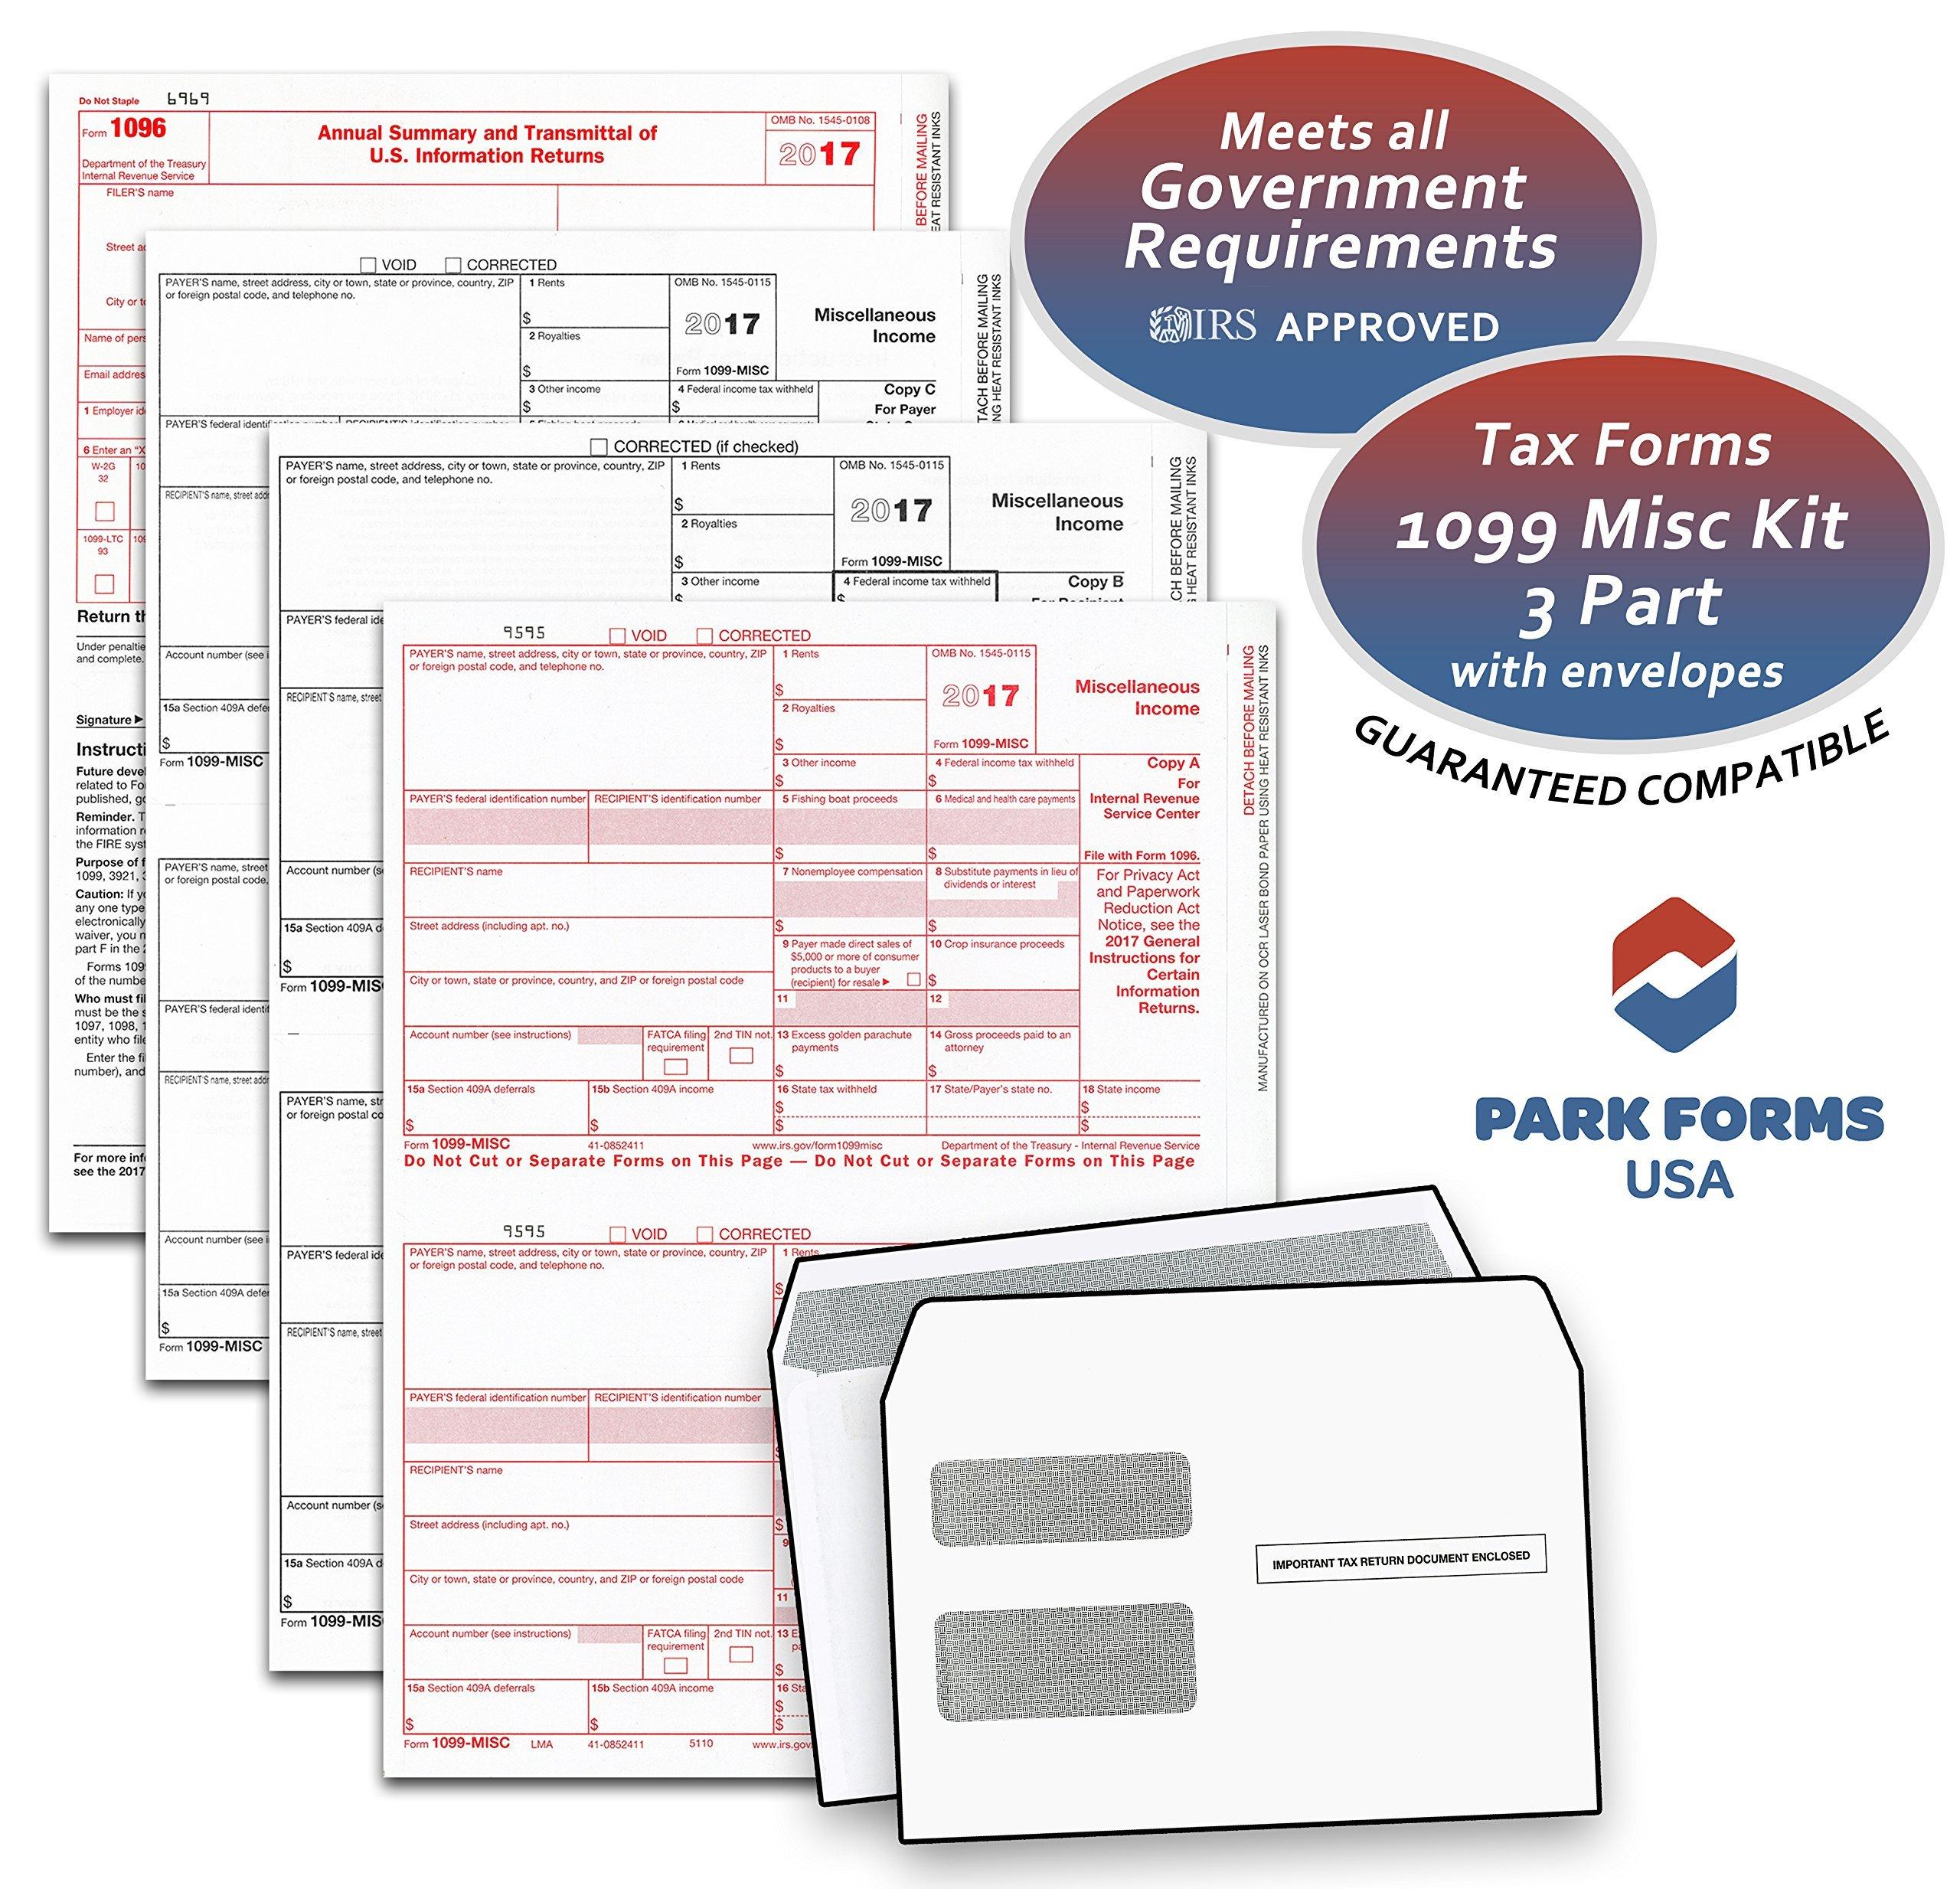 2018 Laser Tax Forms - 1099-MISC Income 3-Part Set & Envelope Kit for 50 Individuals - Park Forms